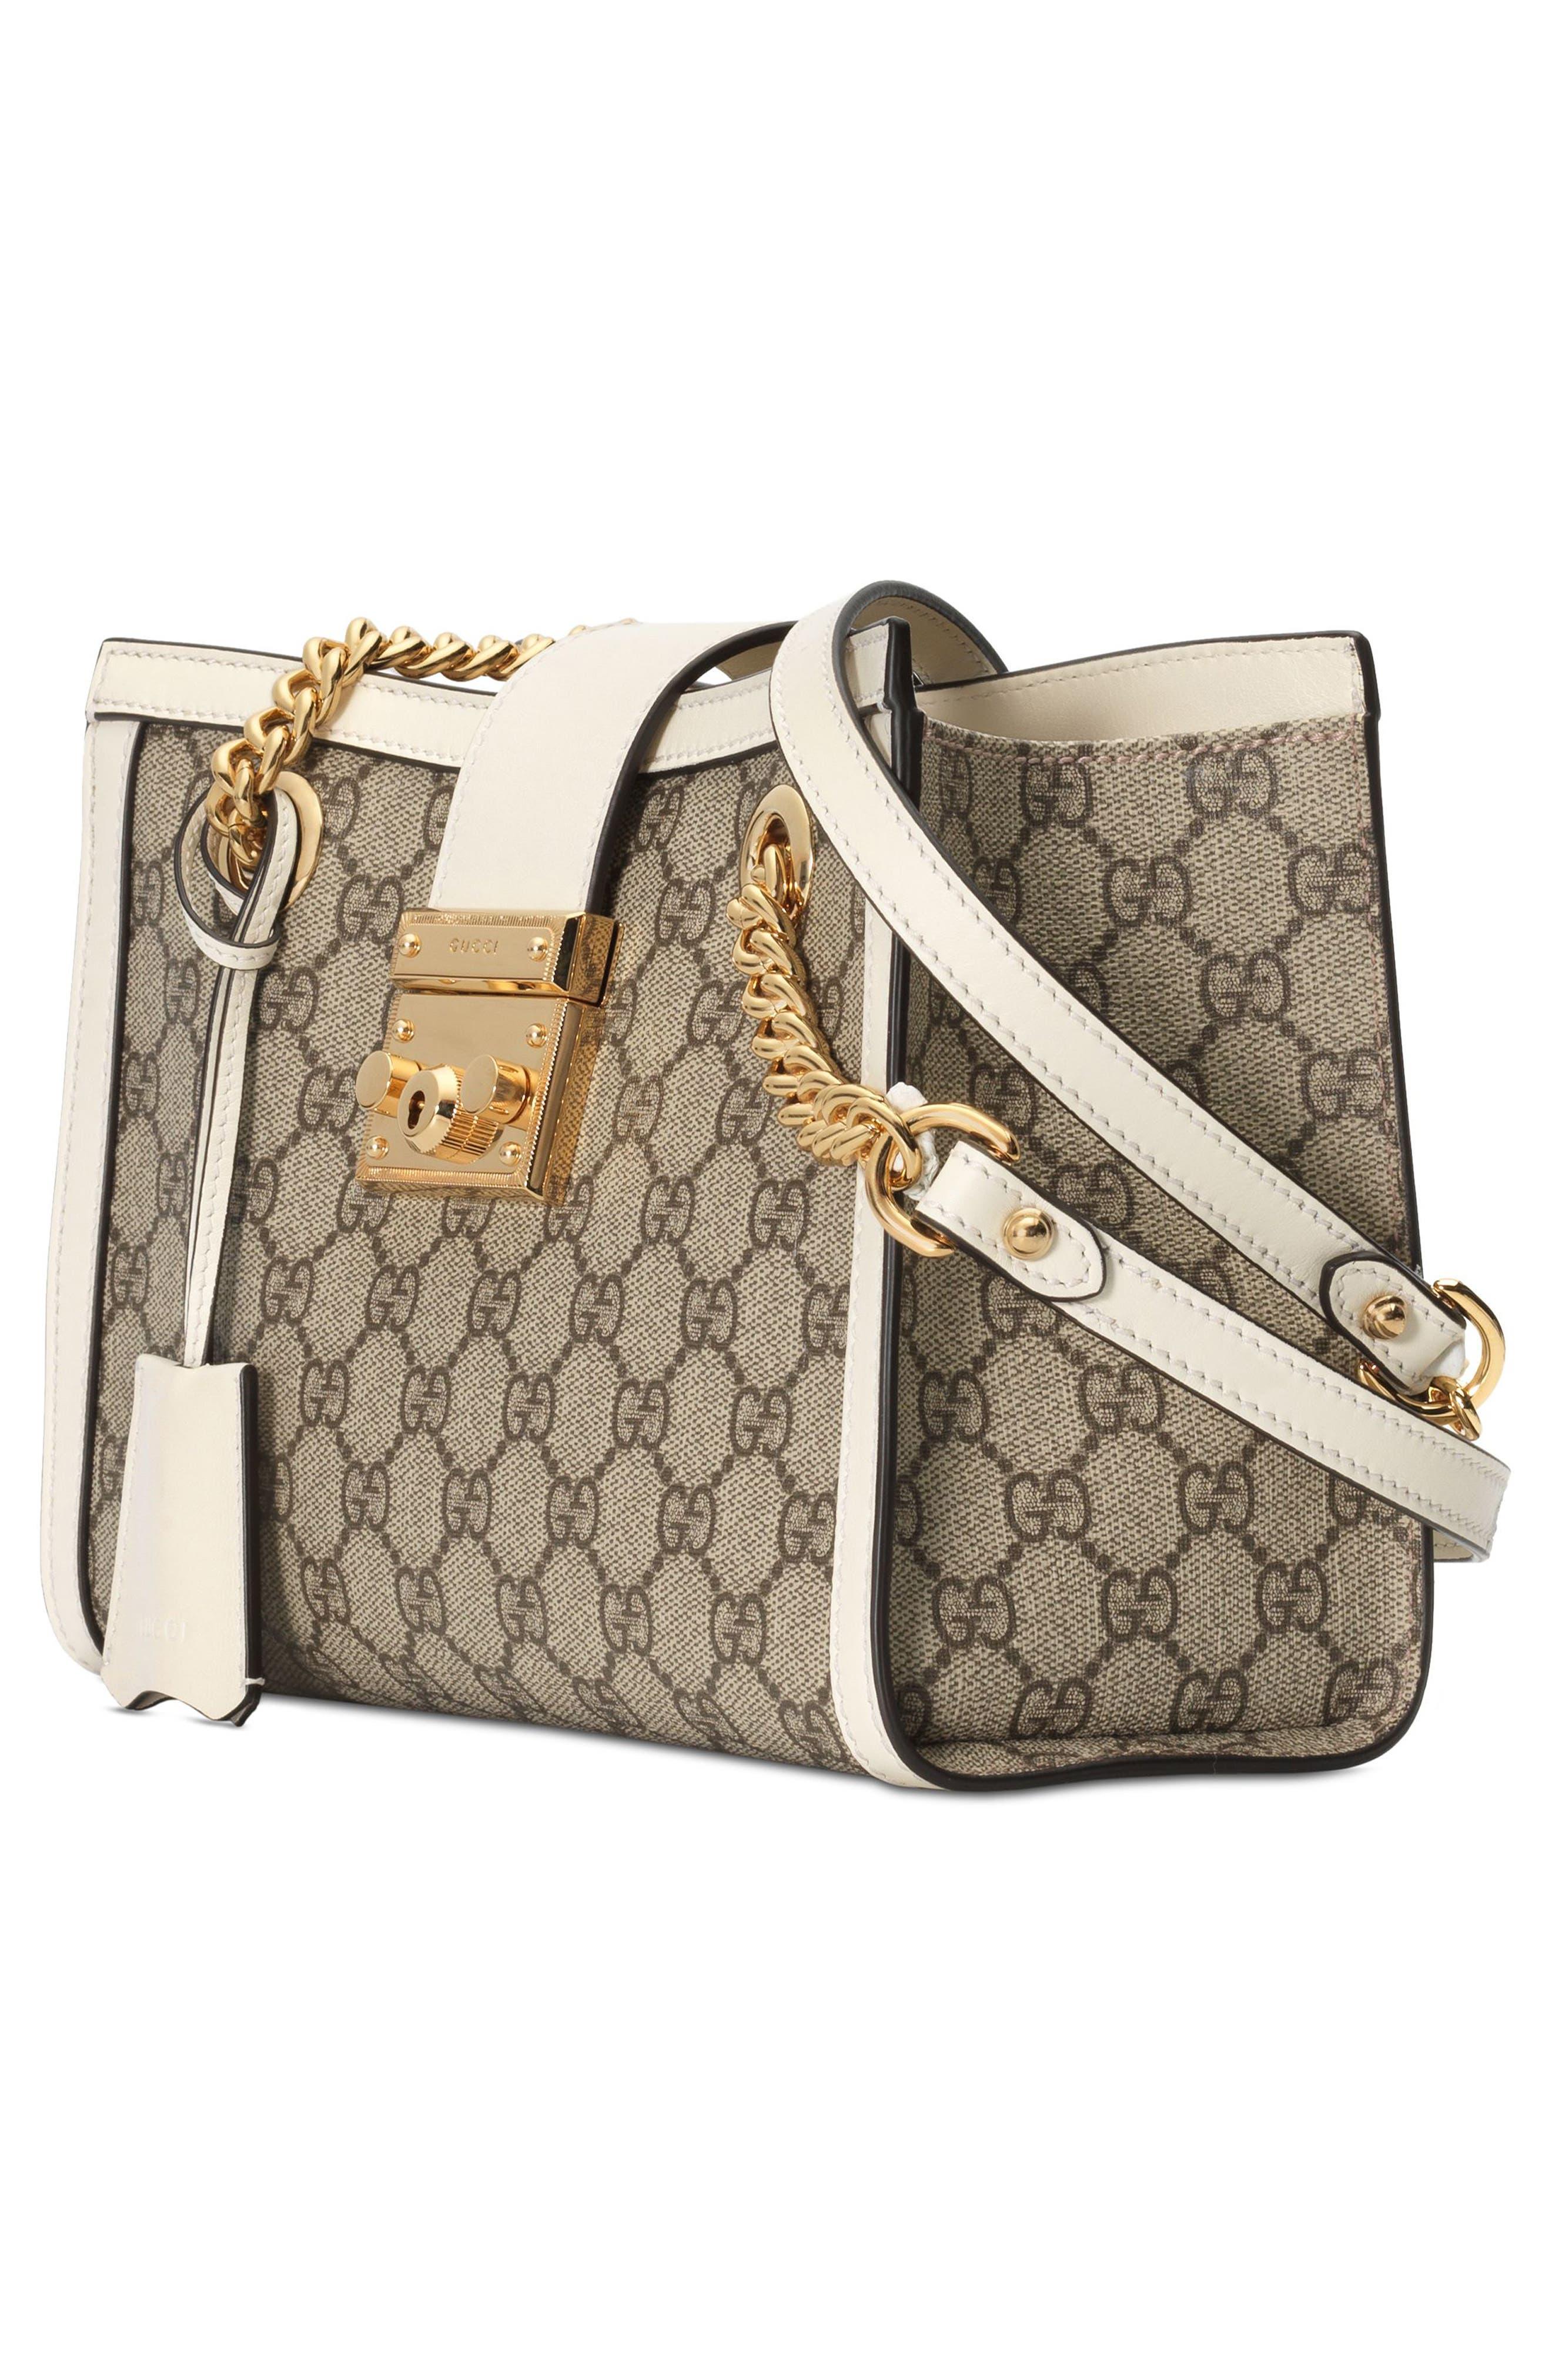 Small Padlock GG Supreme Shoulder Bag,                             Alternate thumbnail 4, color,                             BEIGE EBONY/ MYSTIC WHITE